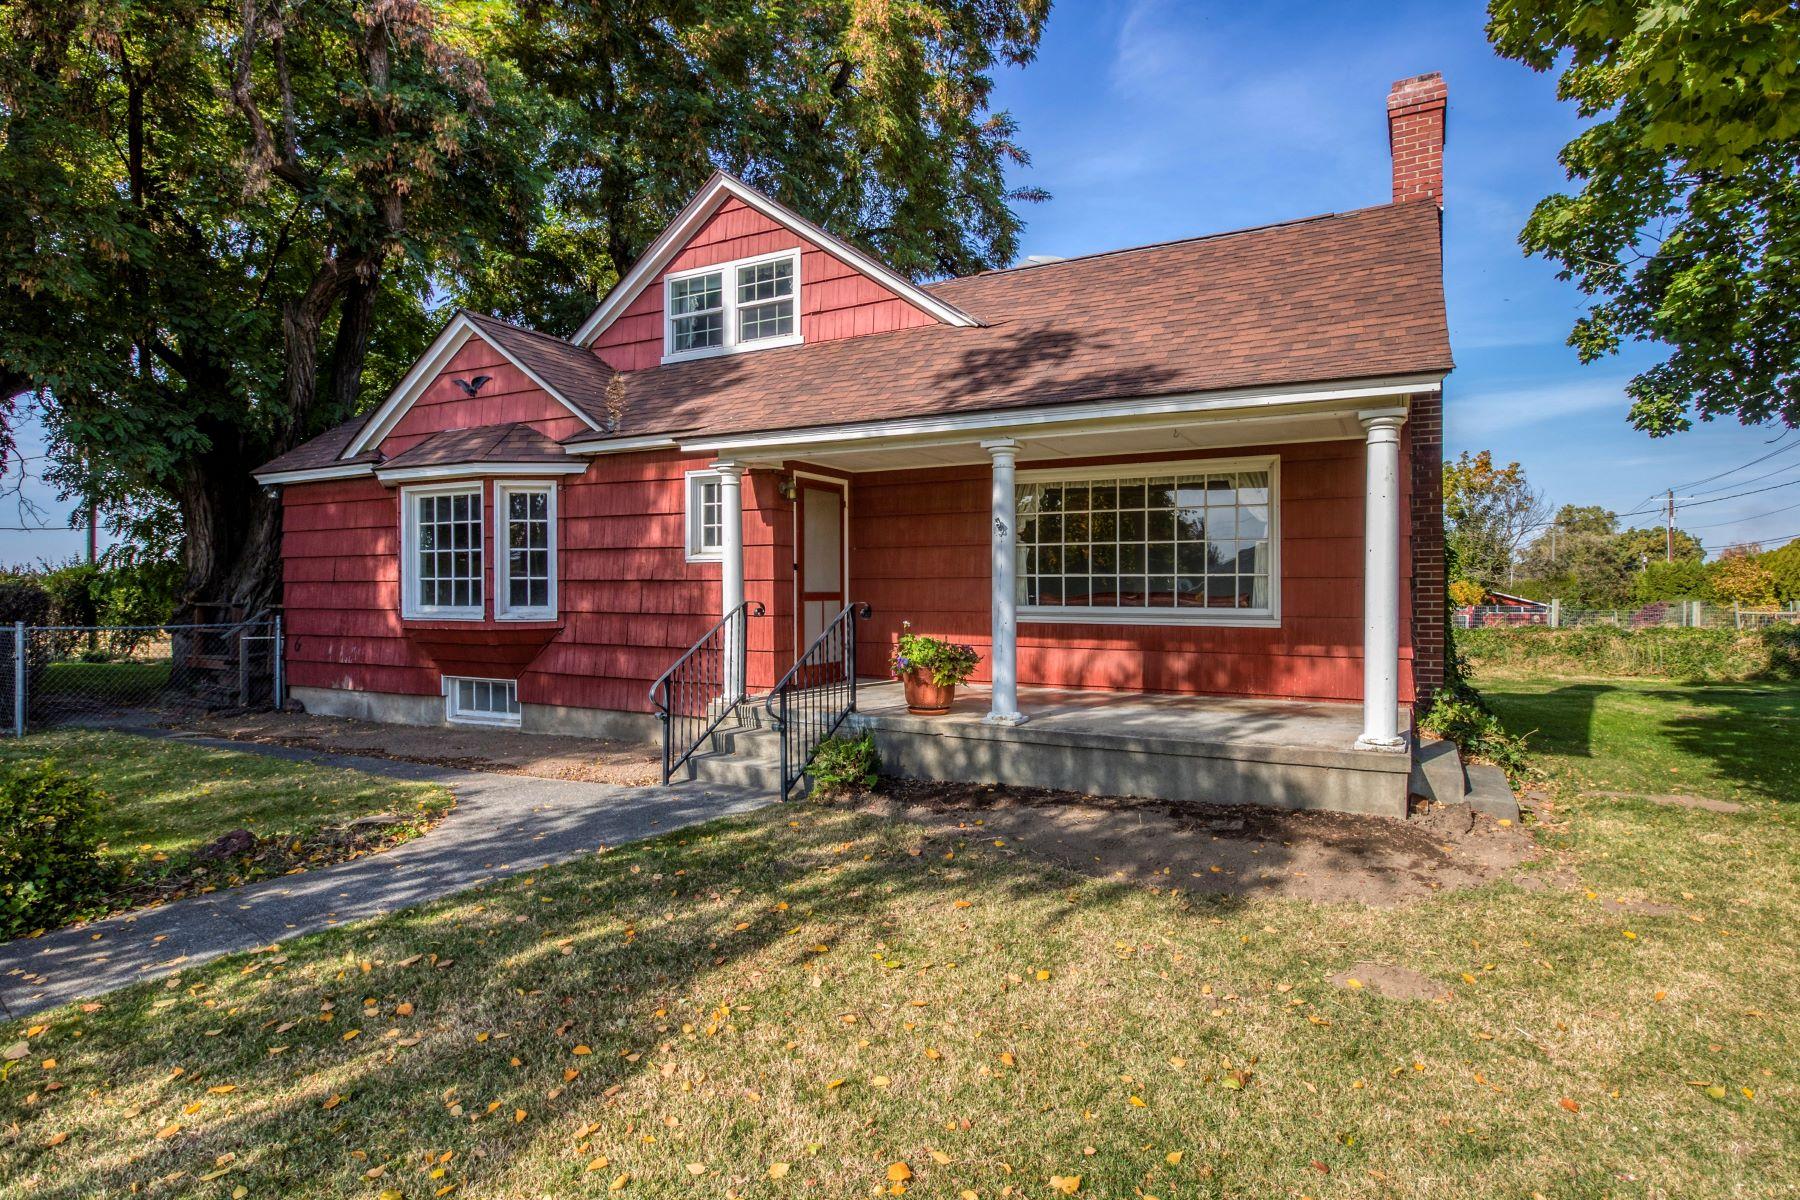 Single Family Homes for Sale at 1010 Highland Road Walla Walla, Washington 99362 United States